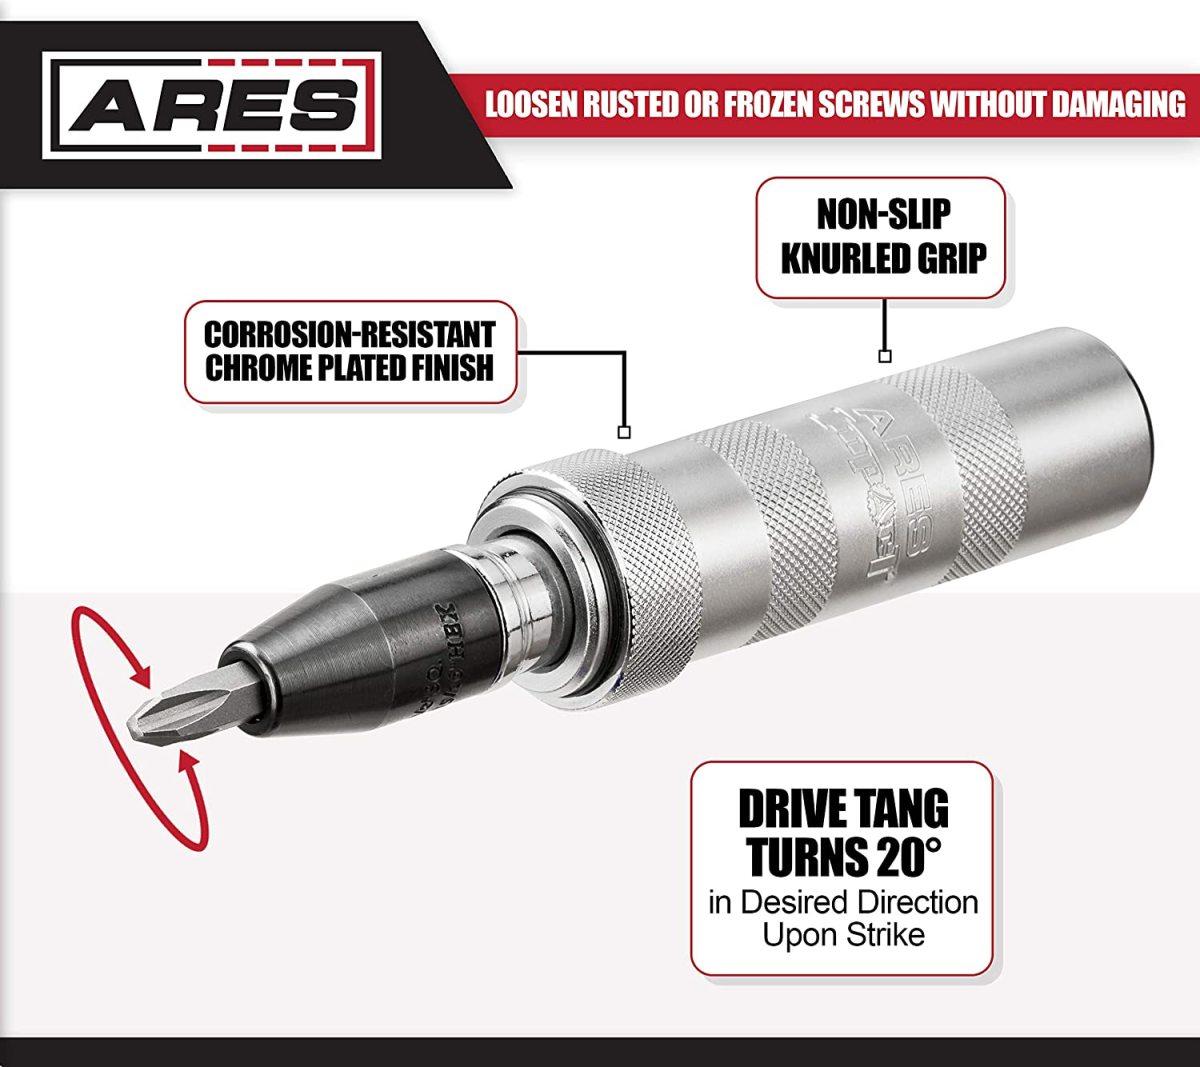 how-to-remove-screws-from-a-door-hinge